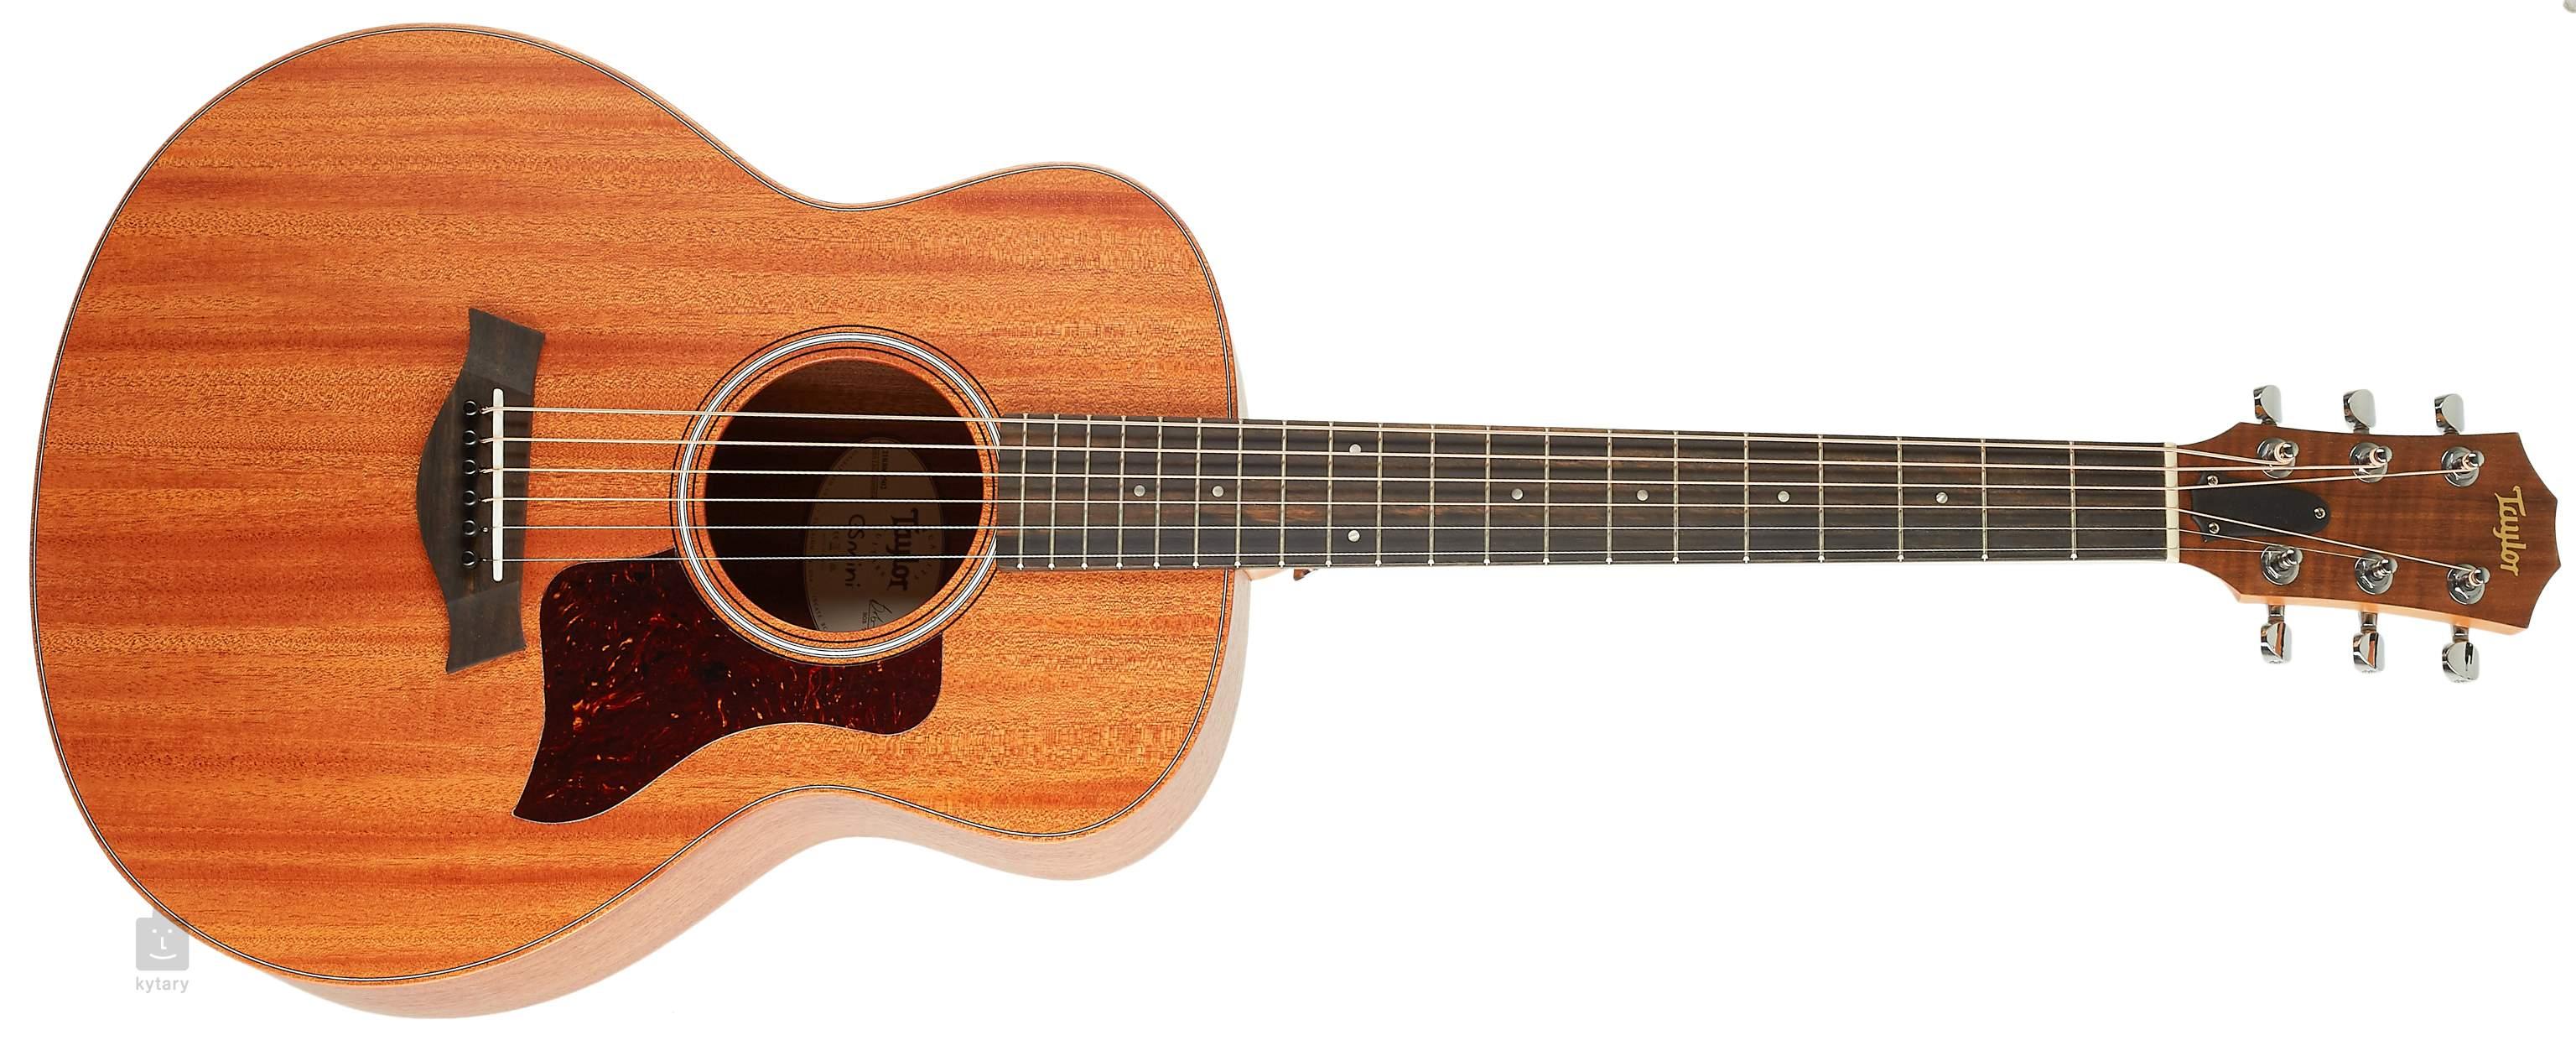 Tan Taylor GS Mini Guitar Gig Bag